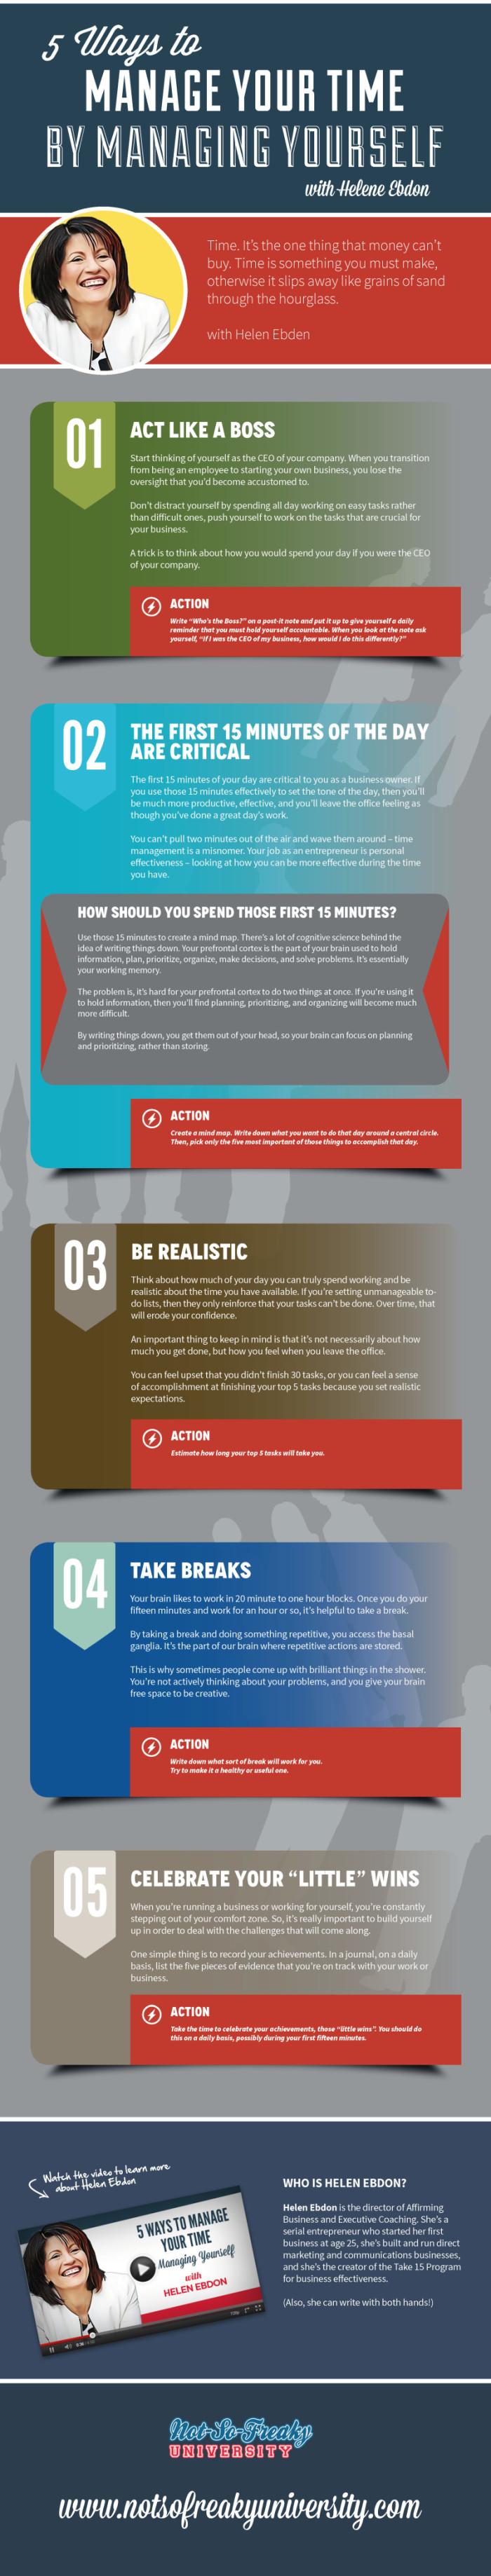 james -helene ebdon infographic - NSFU 01